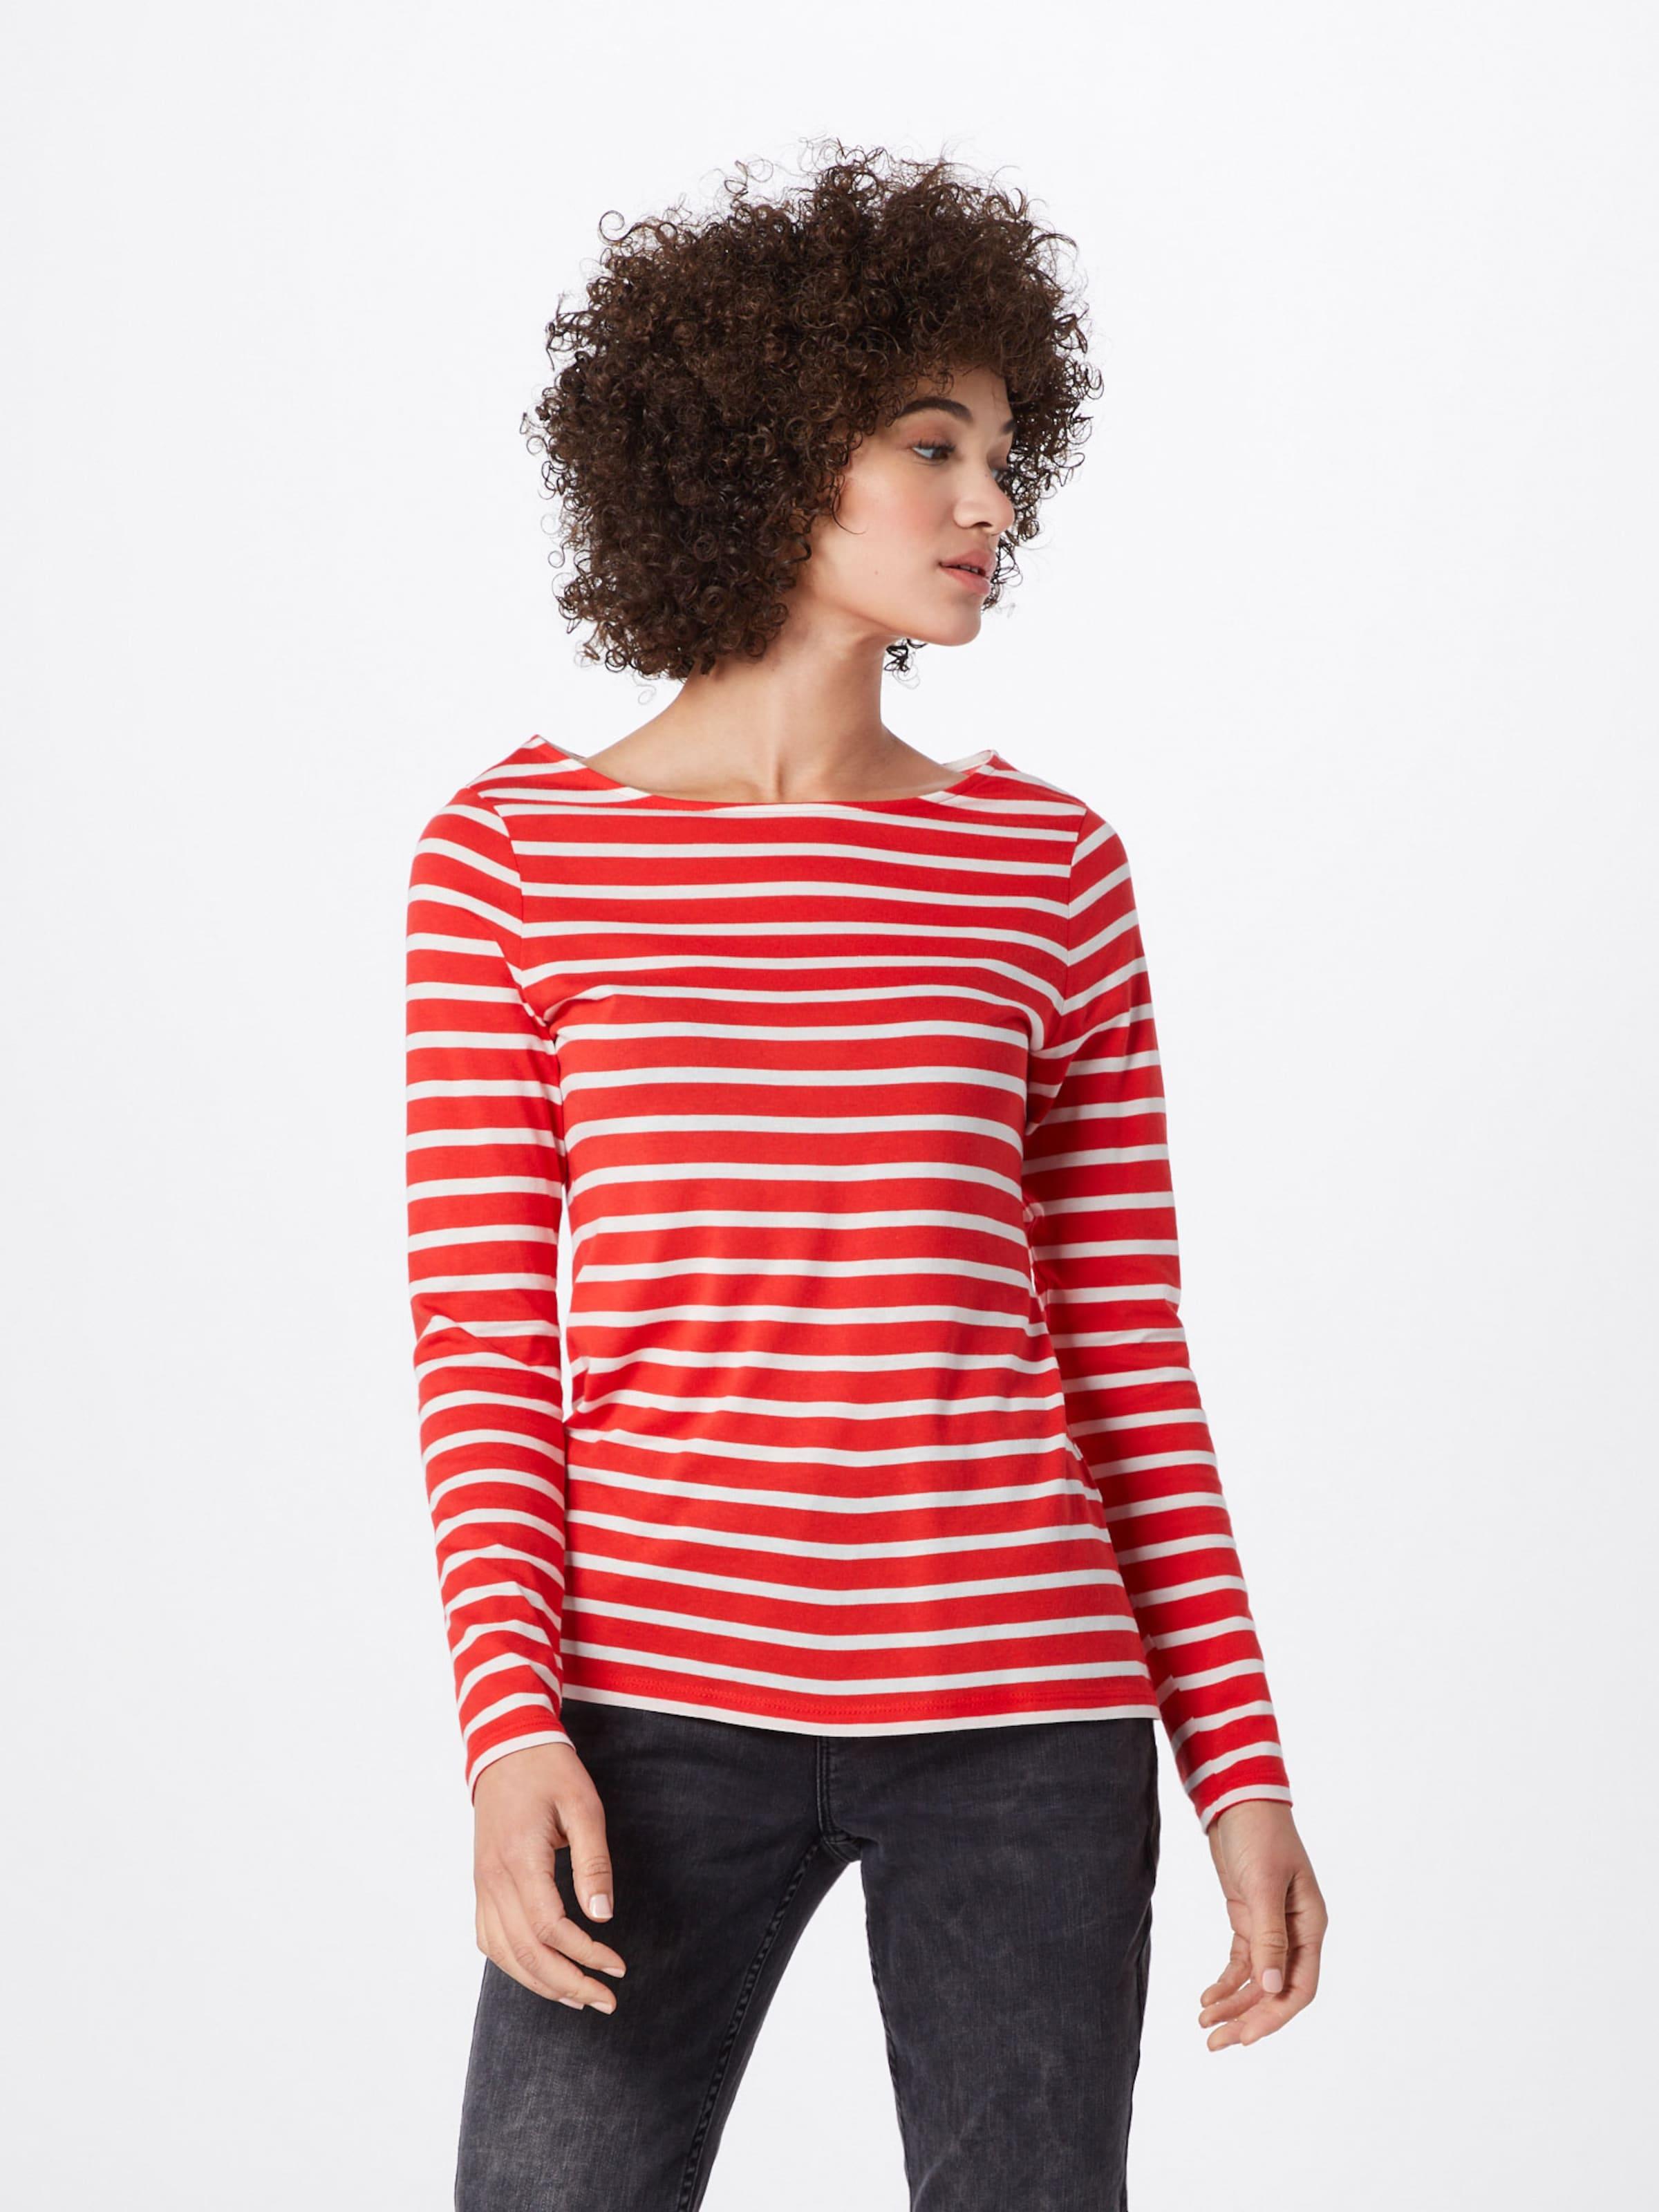 Shirt In RotWeiß Moreamp; Active' 'striped PXuZOki